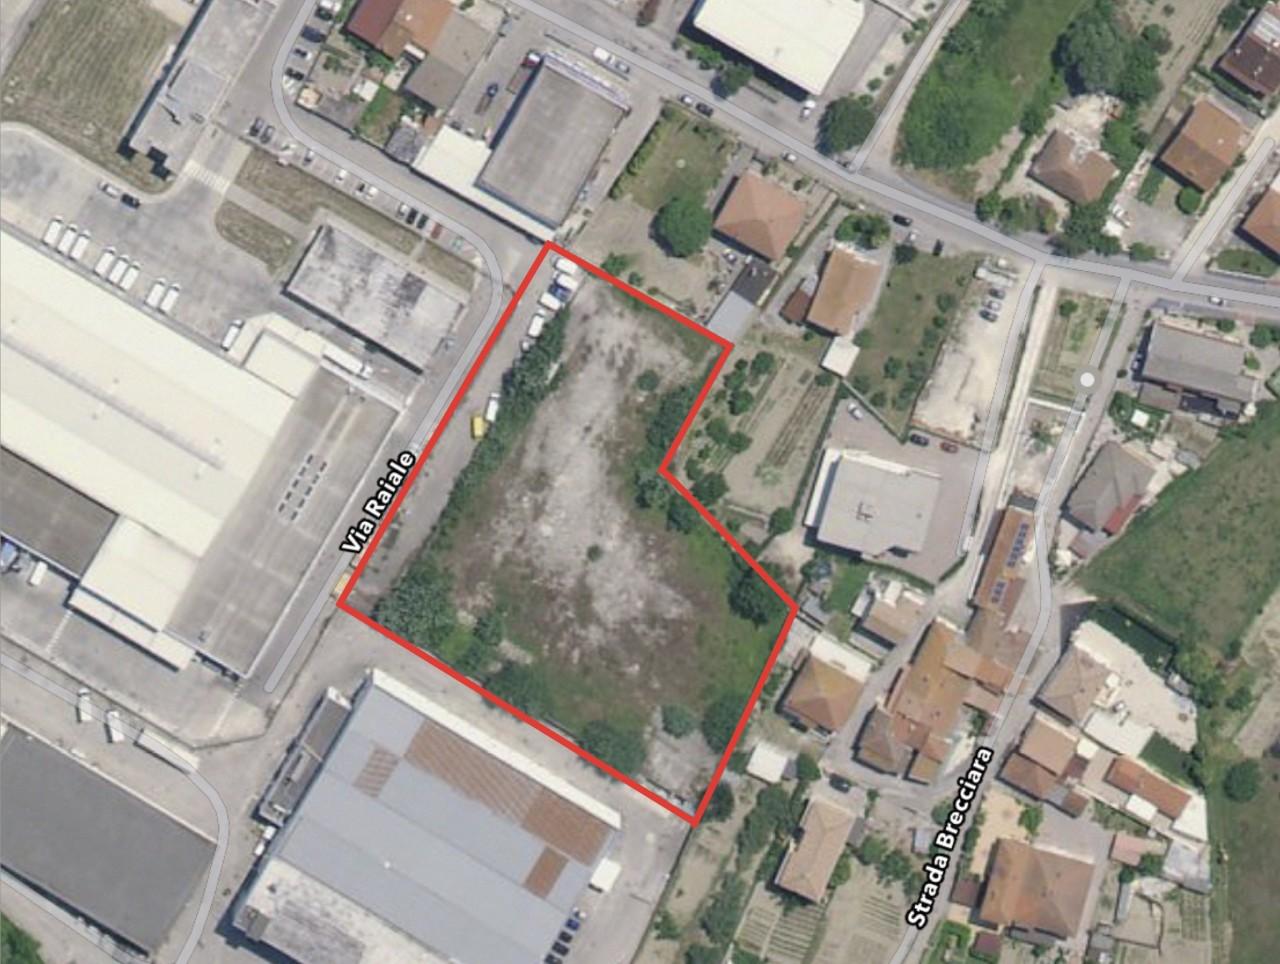 Terreno industriale edificabile in Zona Franca